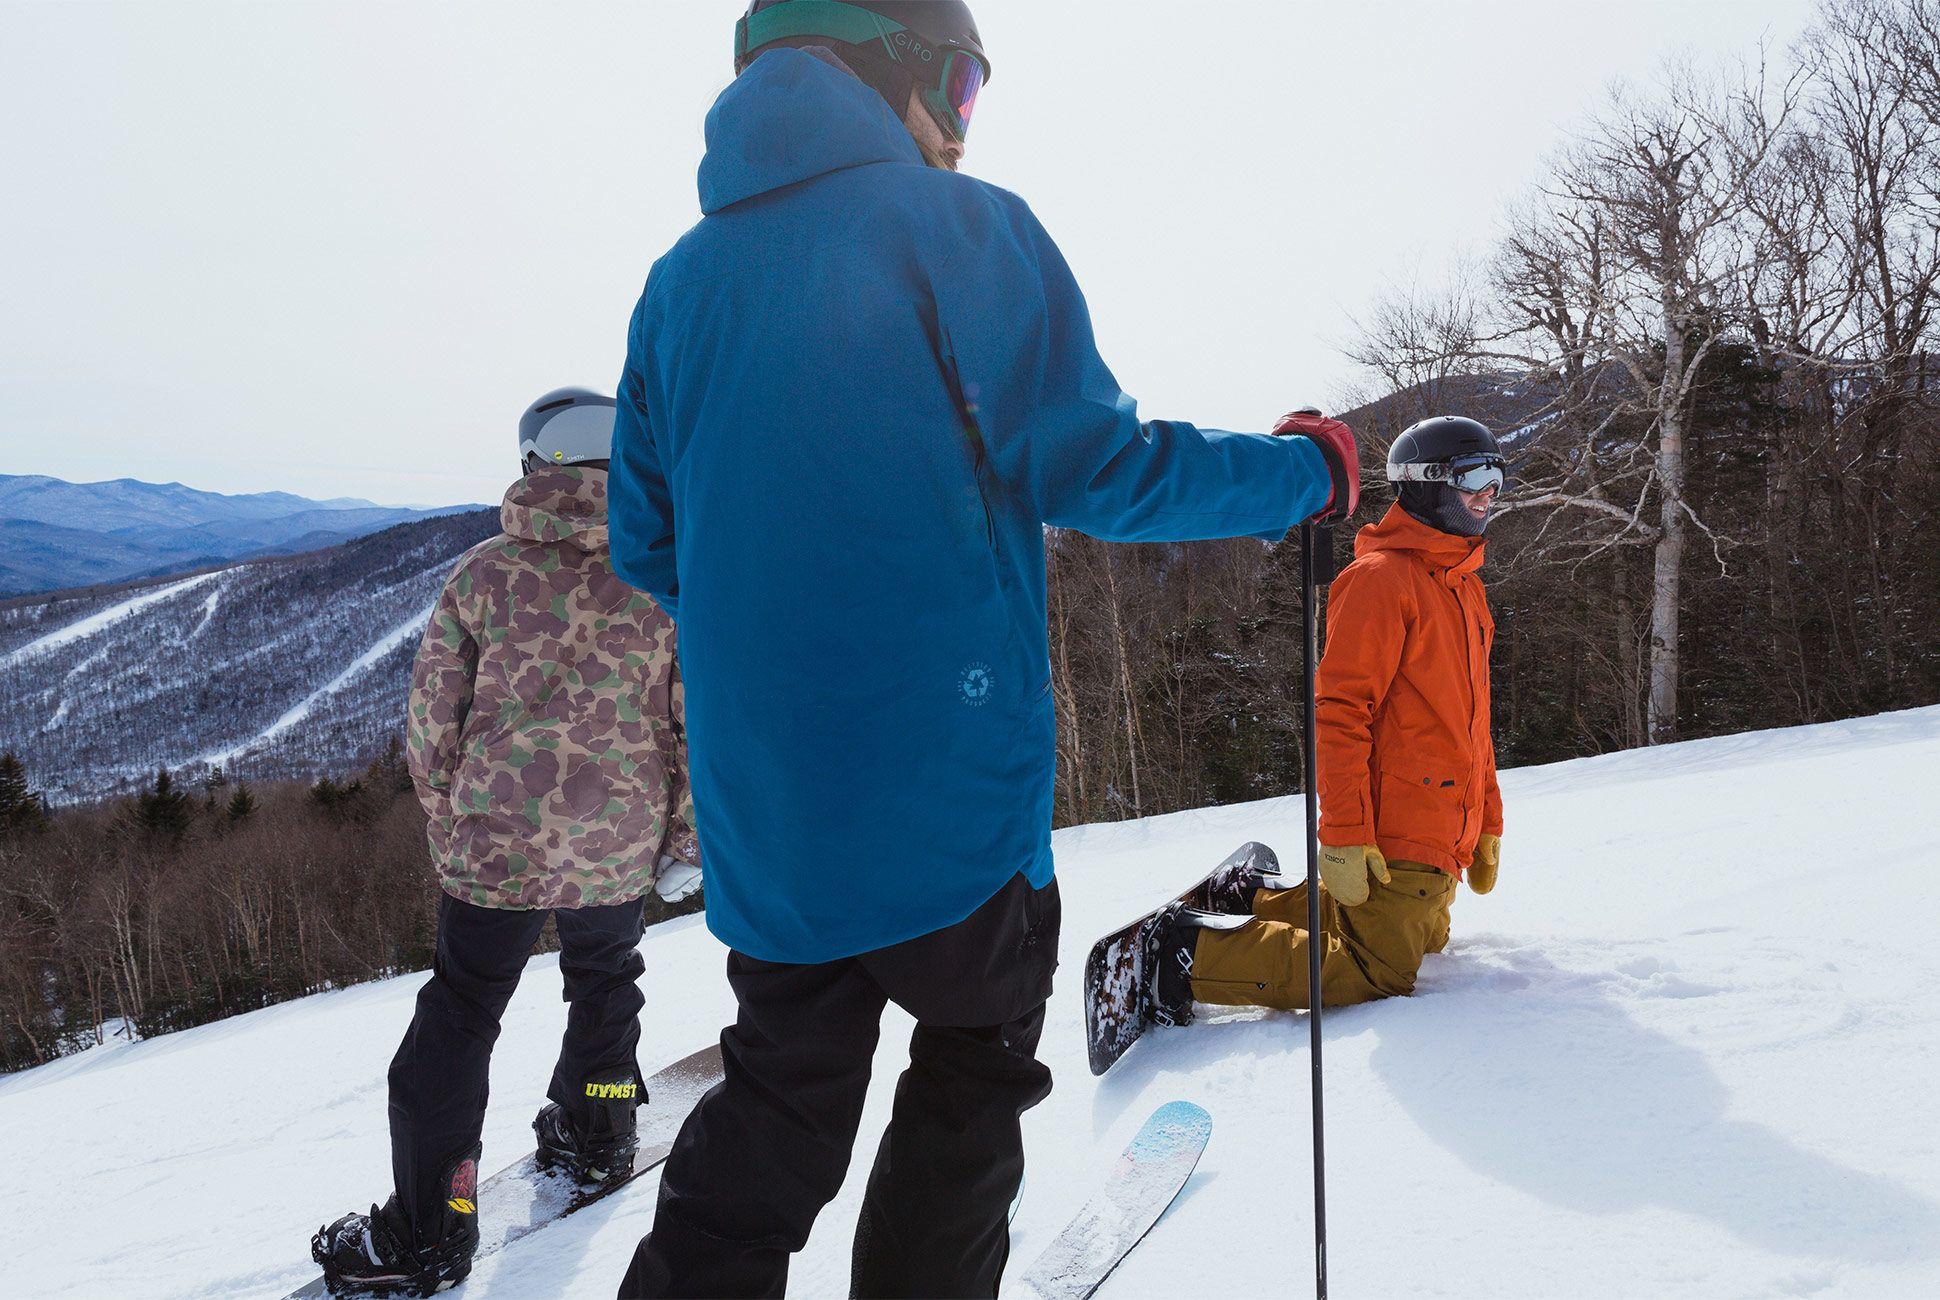 ultimate-ski-and-snow-gear-patrol-dakine-slide-6